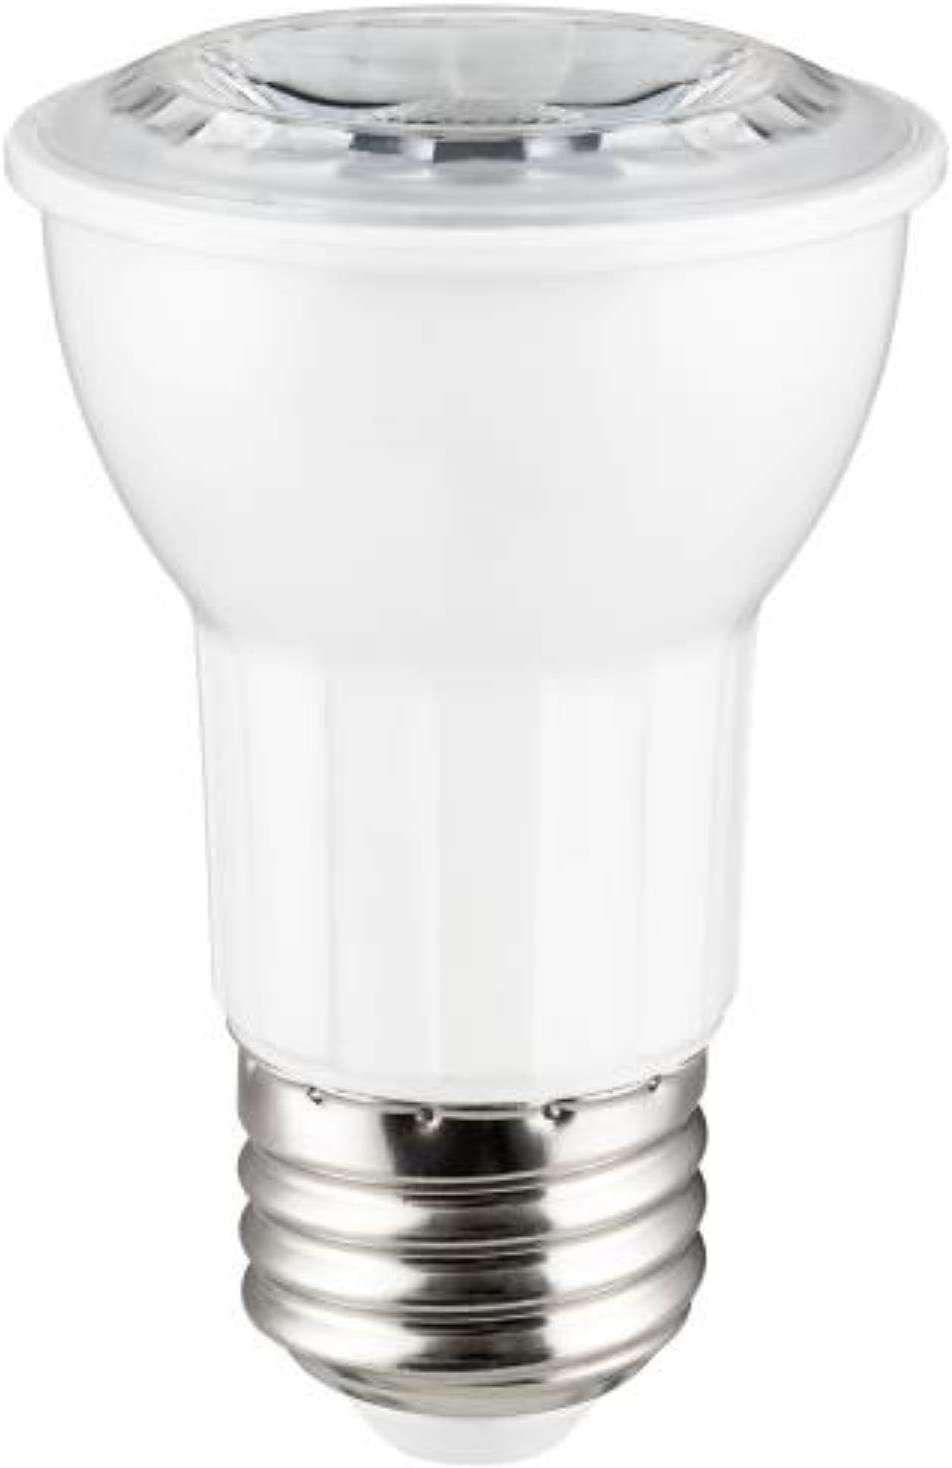 Sunlite 80124-SU LED PAR16 Light 7 watts (75W Equivalent), 500 Lumens, Medium (E26) base, Dimmable, ETL Listed, 1 Pack, 27K - Warm White